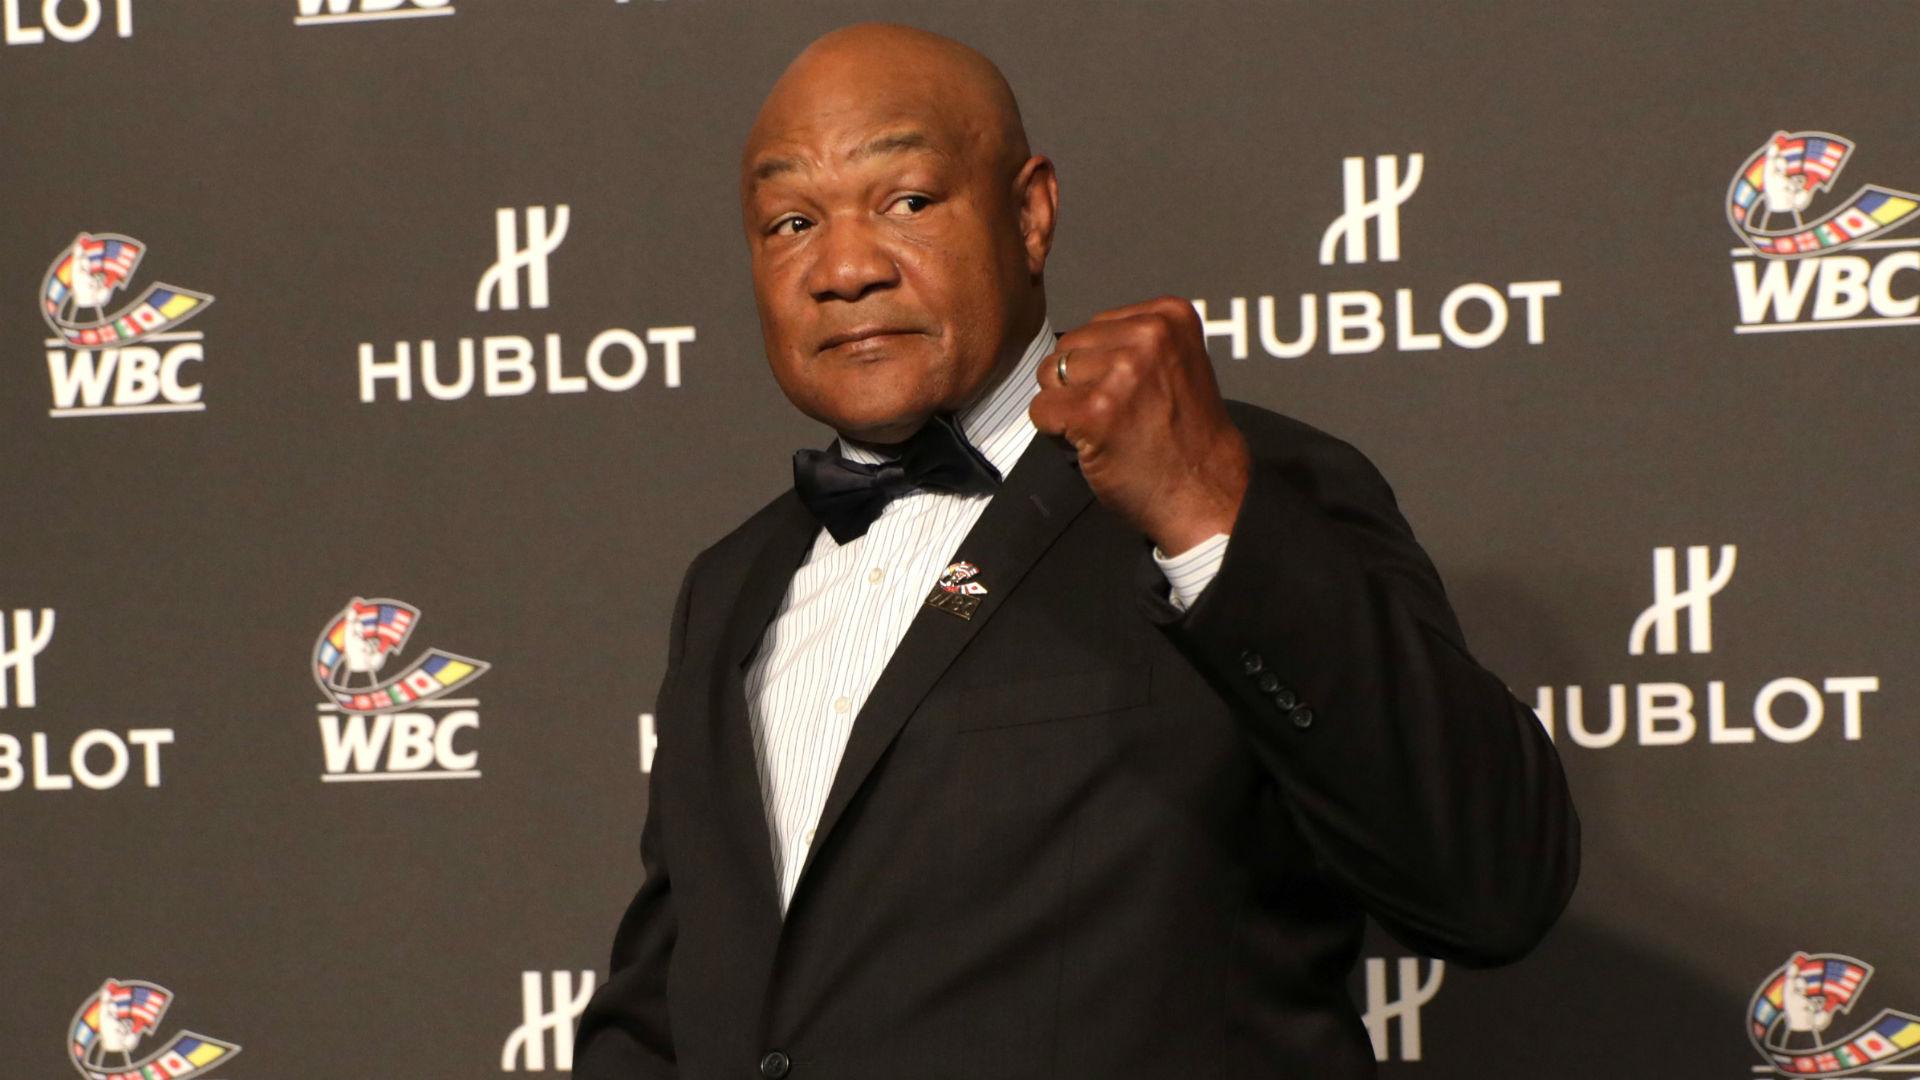 Mike Tyson comeback vs. Roy Jones Jr. 'a beautiful thing' despite risks, says George Foreman